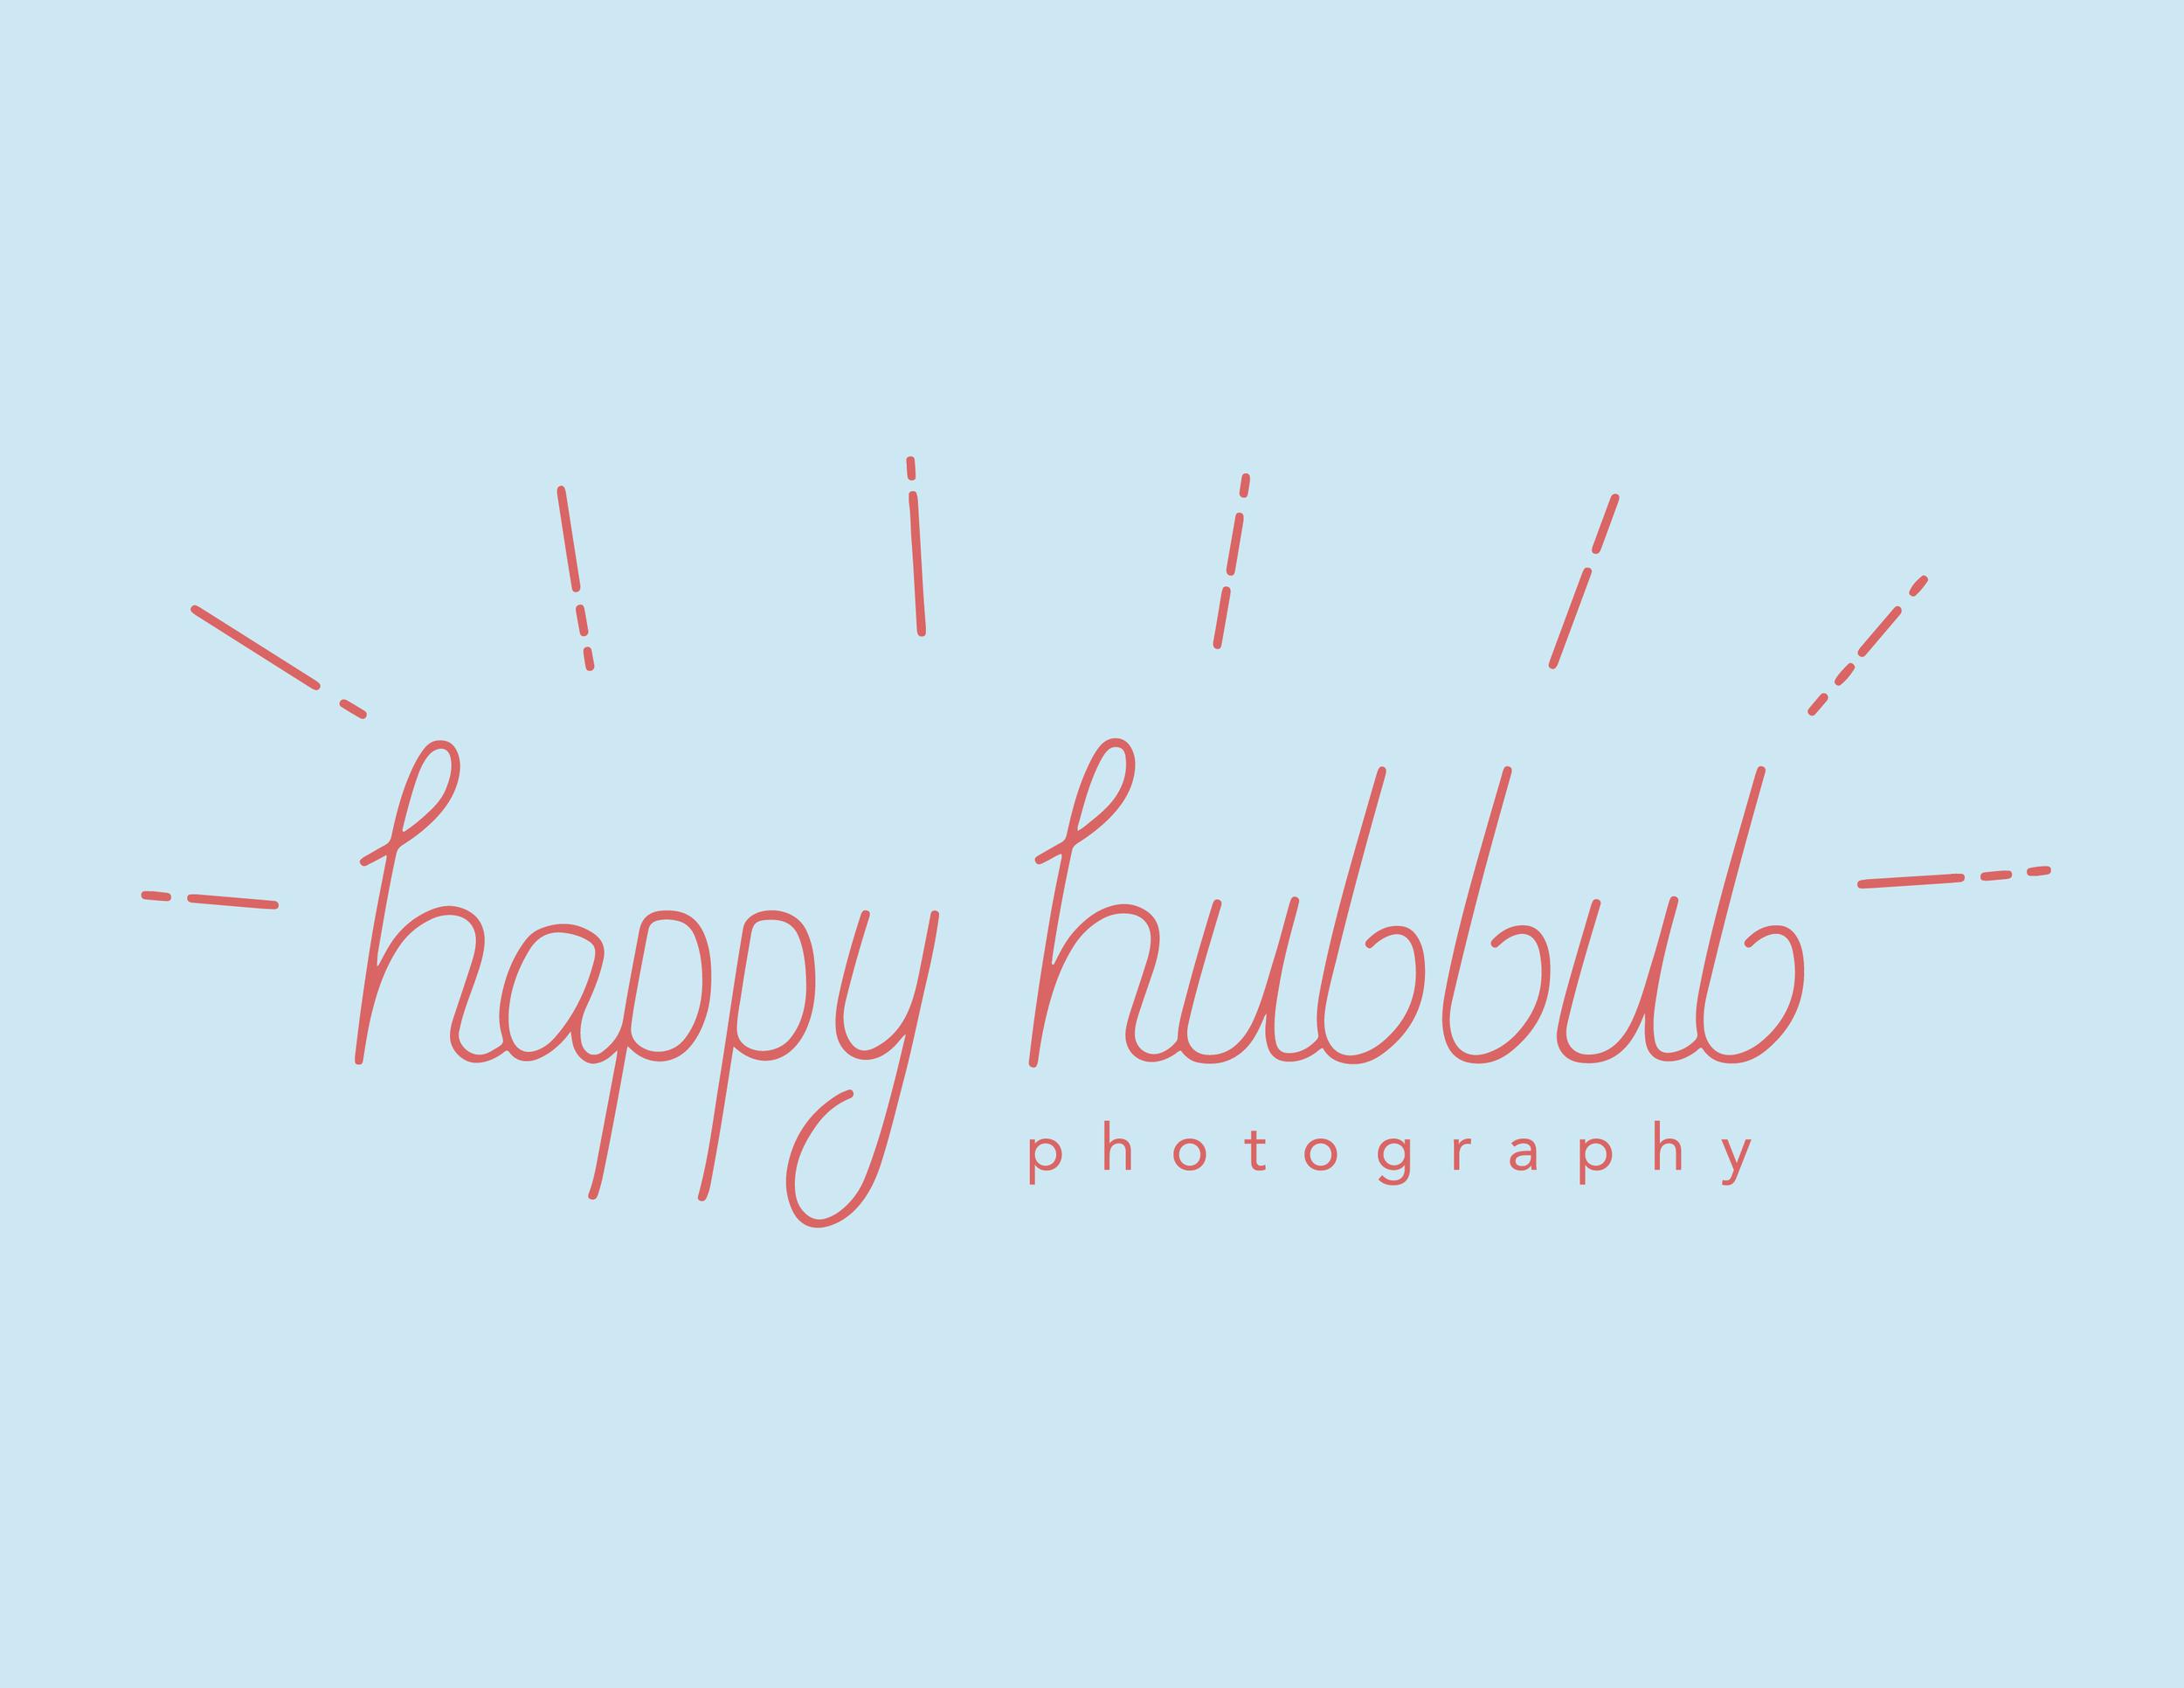 Happy Hubbub logo